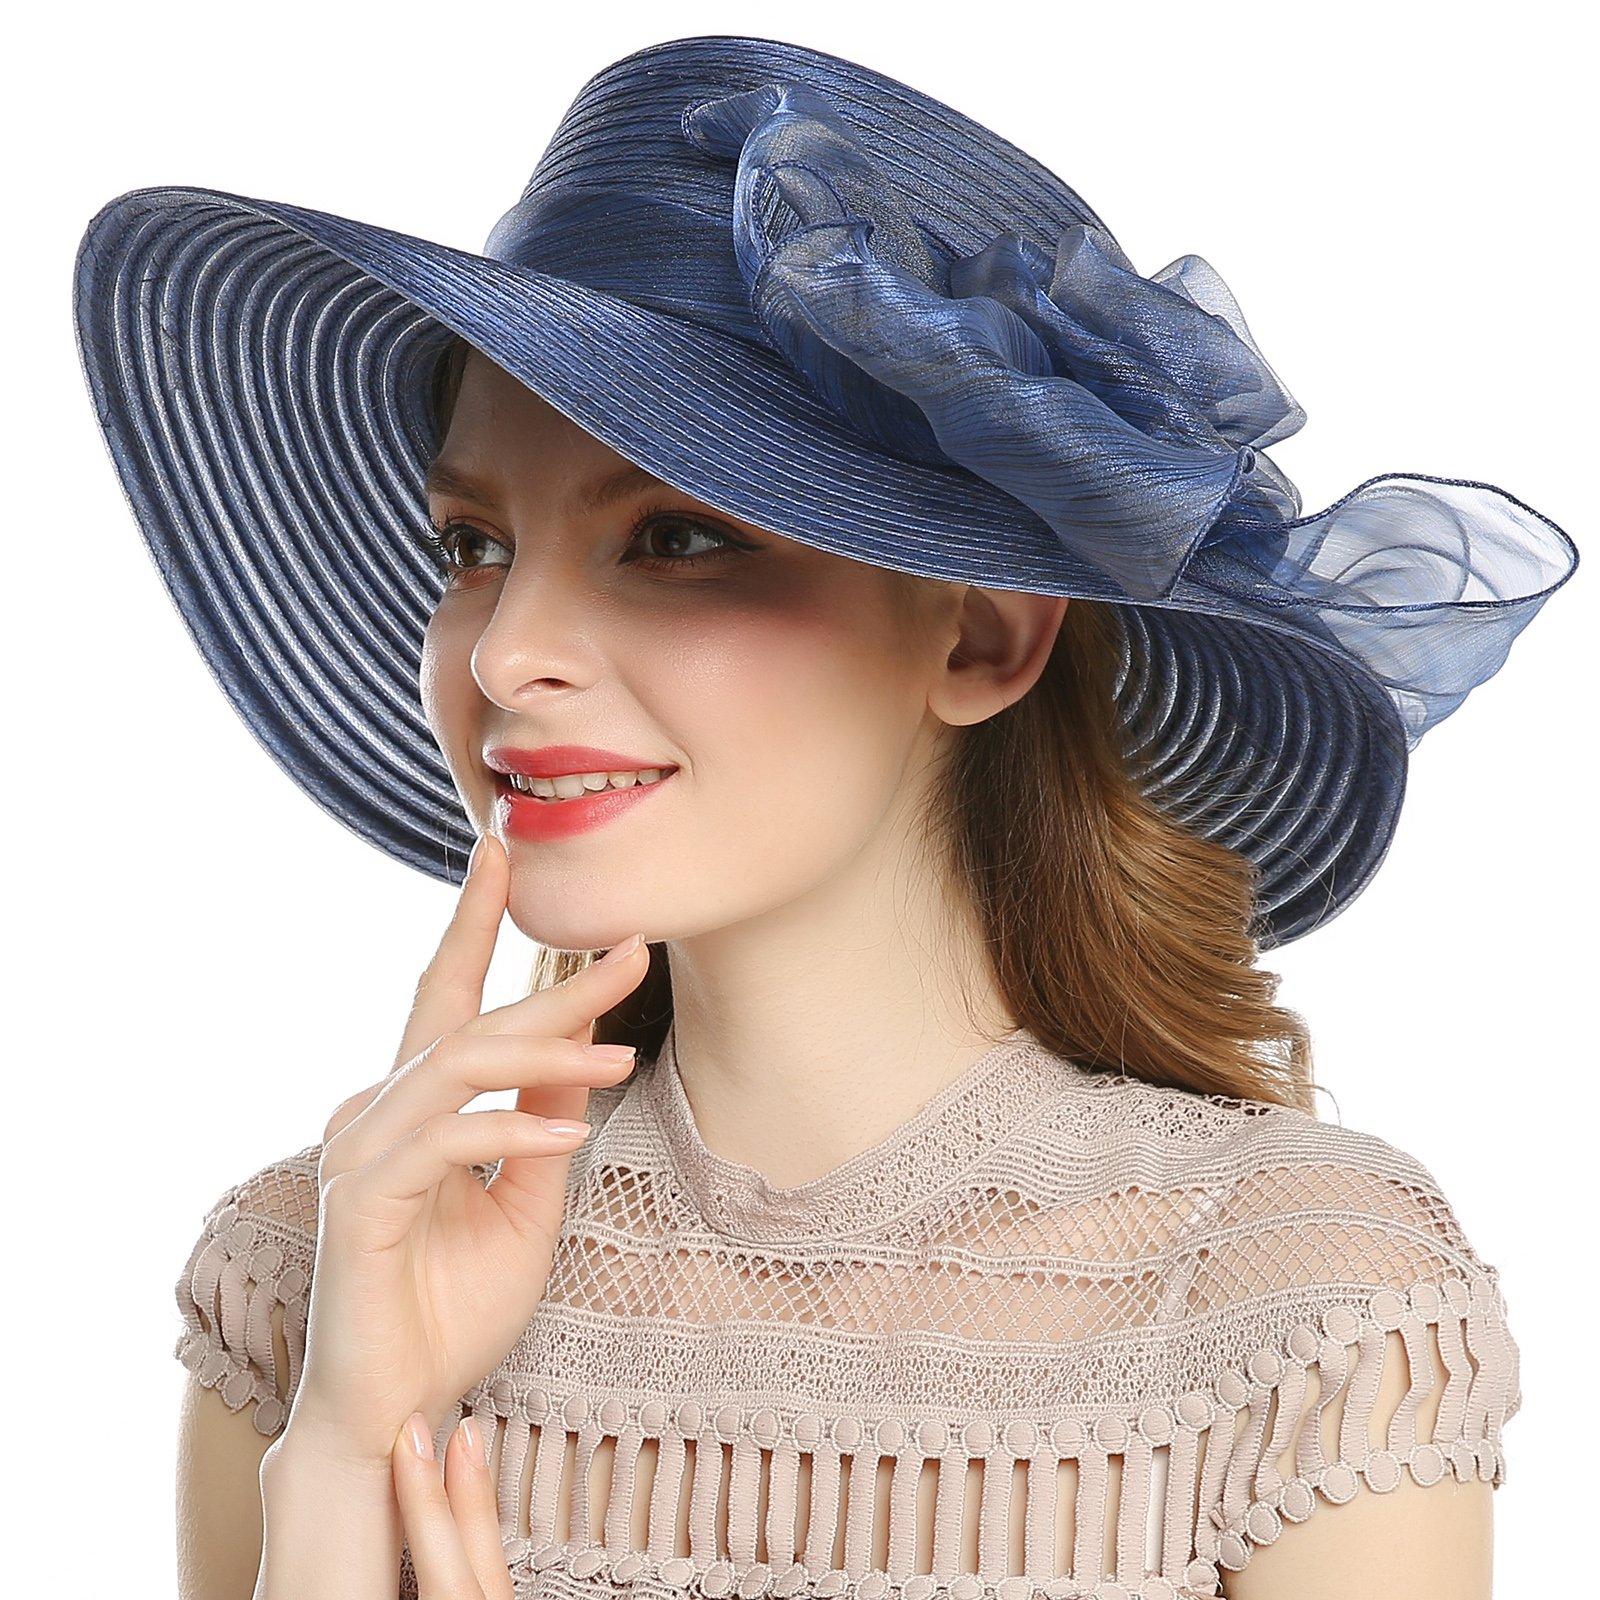 WELROG Women's Derby Church Dress Hat - Wide Brim Floppy Floral Ribbon UPF Protection Wedding Sun Hats(Navy Blue)